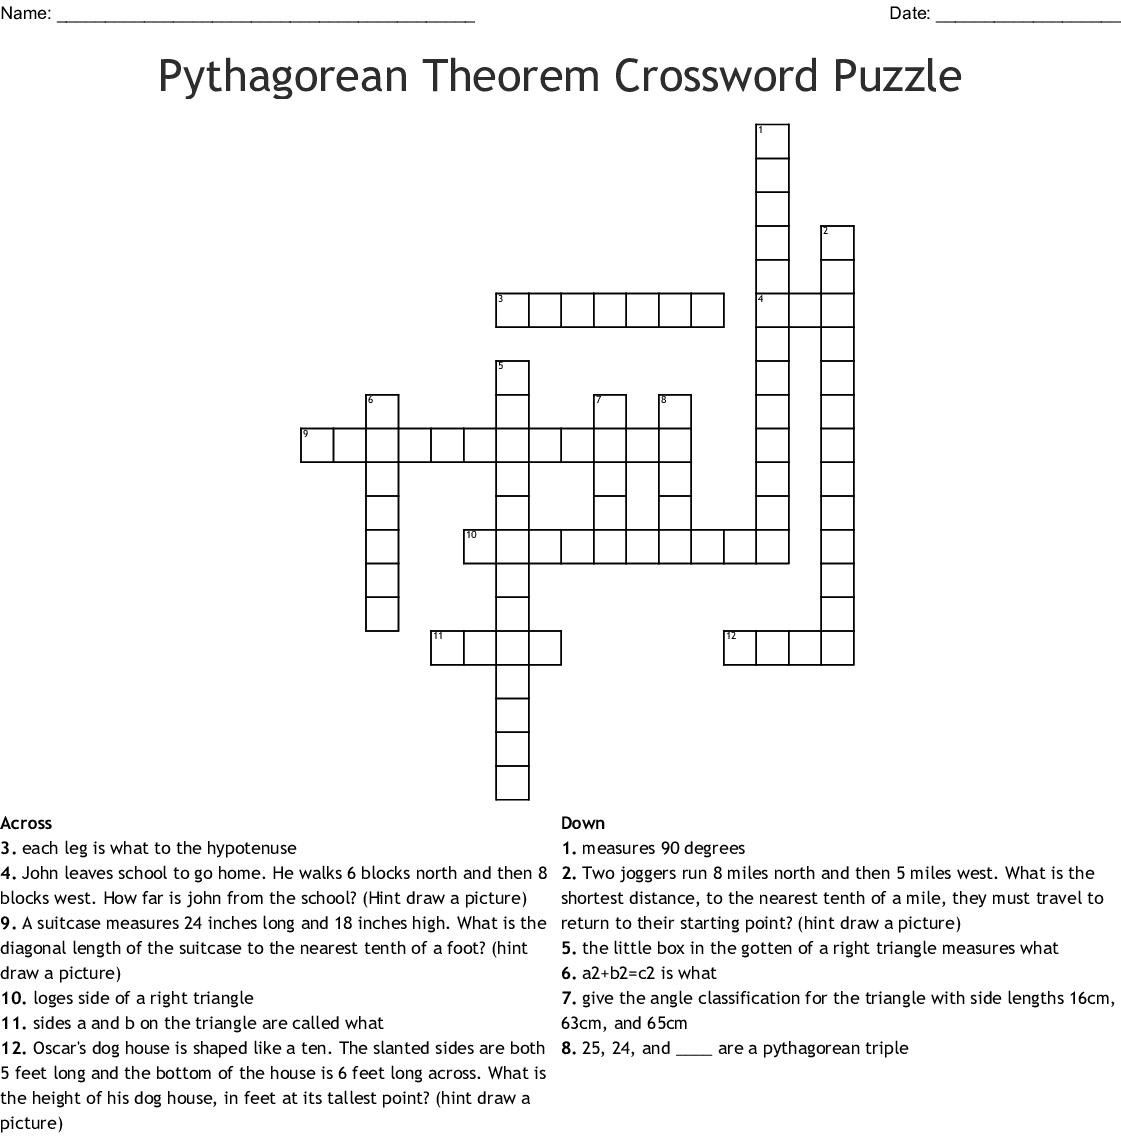 Pythagorean Theorem Crossword Puzzle Wordmint